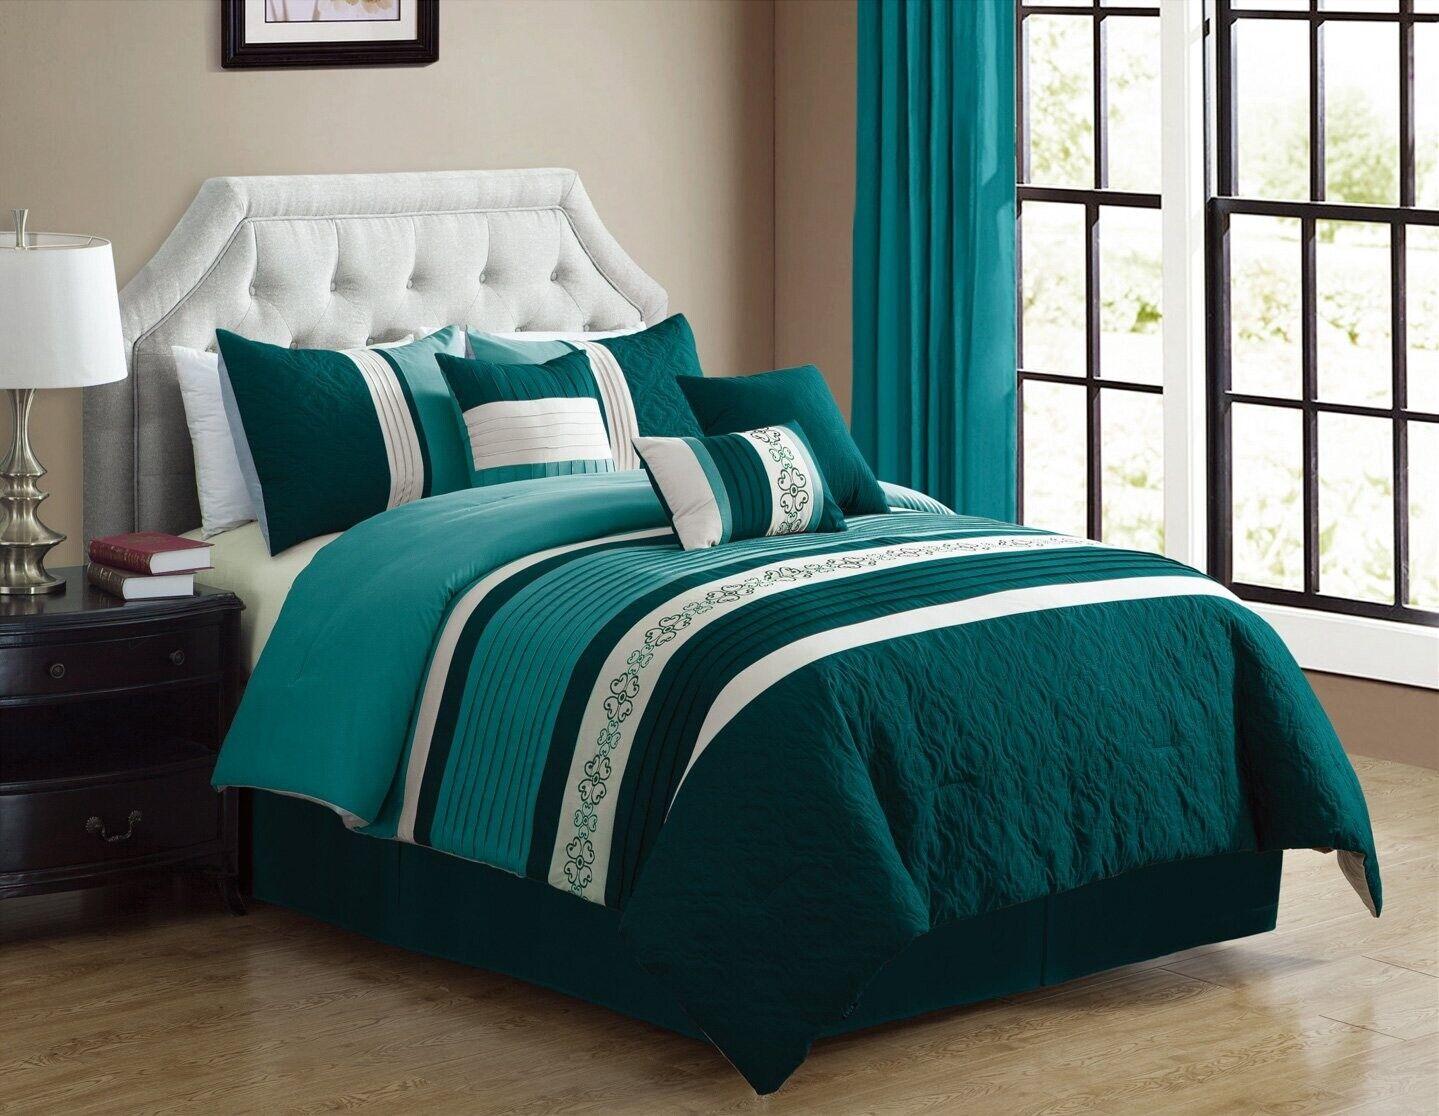 Teal Blau, Weiß  ADYA  Pin Tuck Embroiderot King Größe Comforter Set Bedding